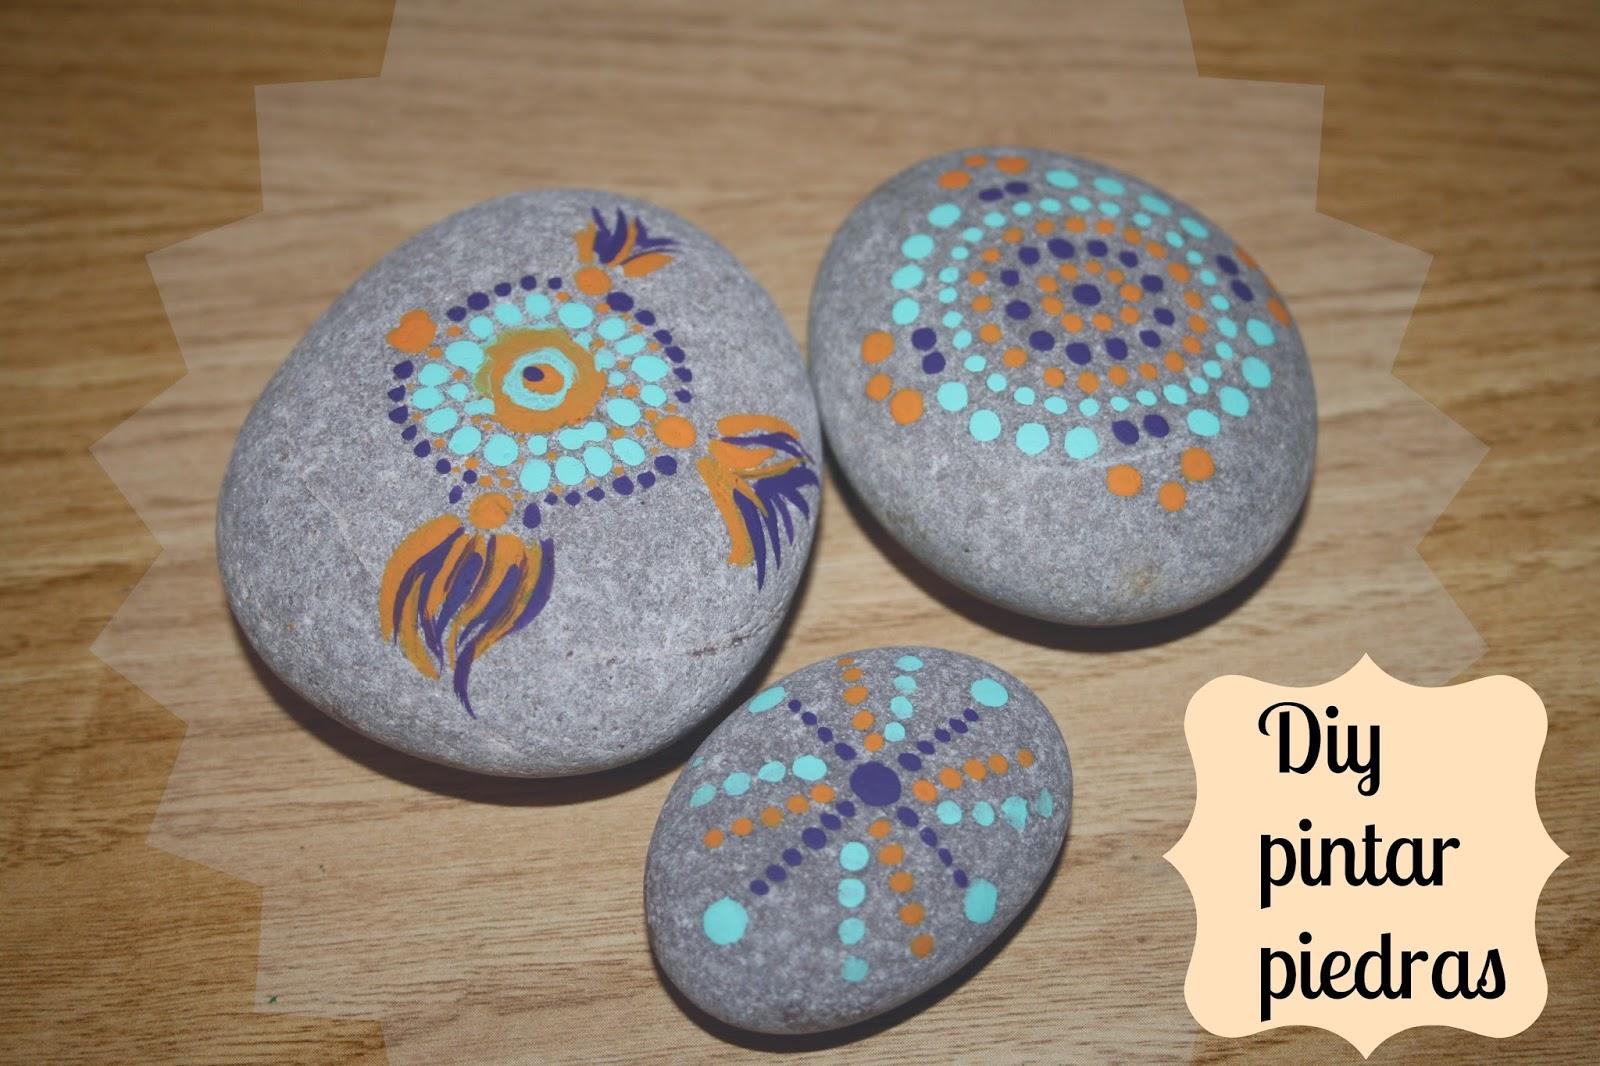 Diy piedras pintadas for Donde conseguir piedras para pintar